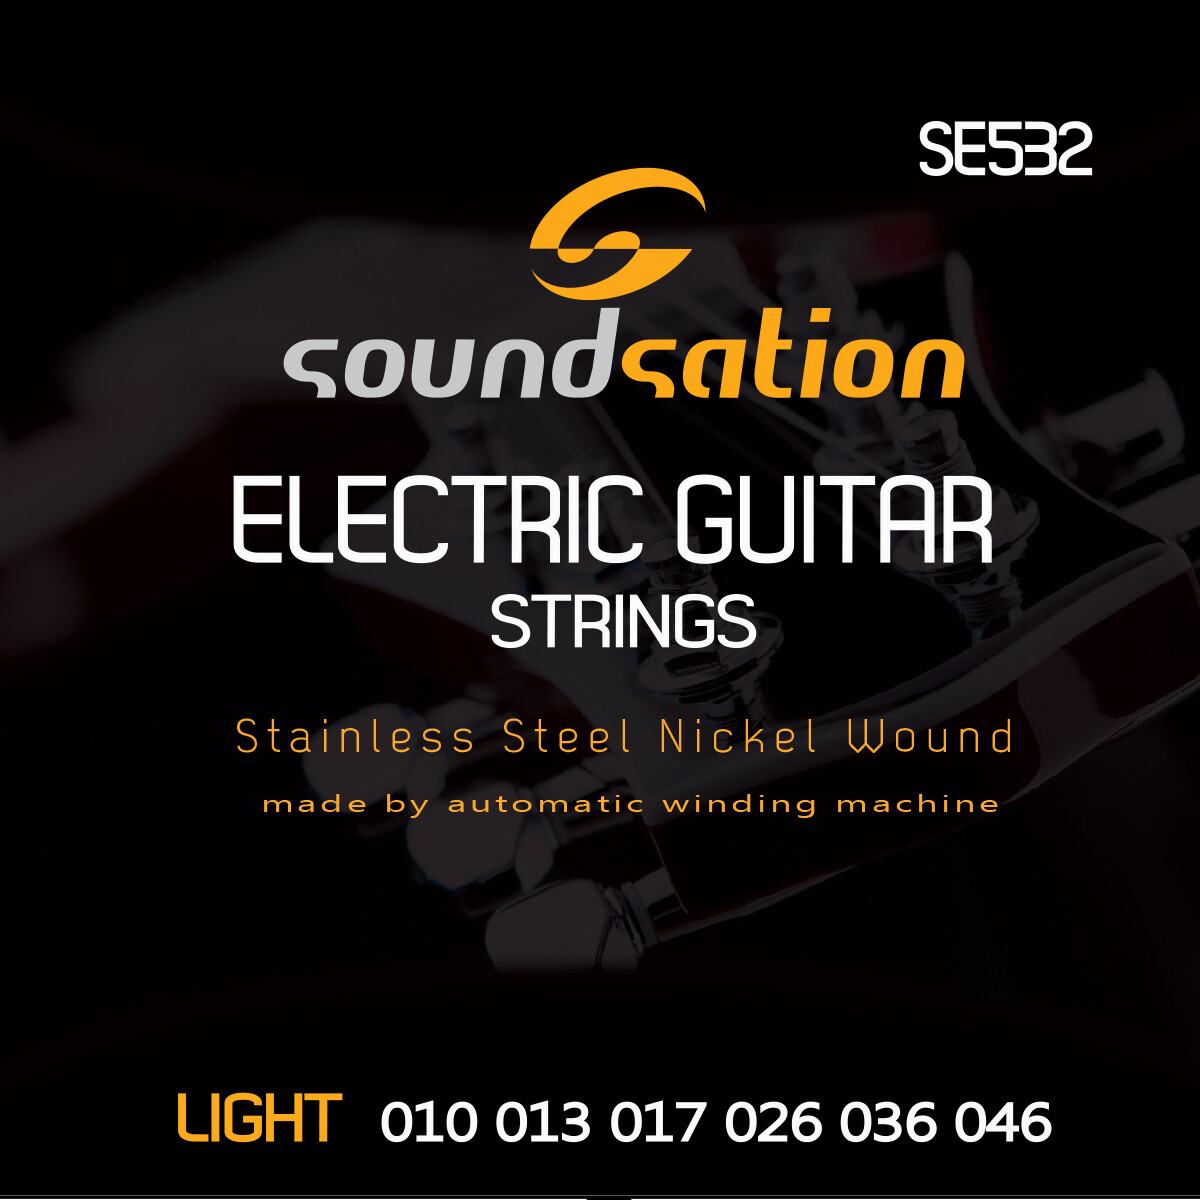 Electric Guitar String  light SE532